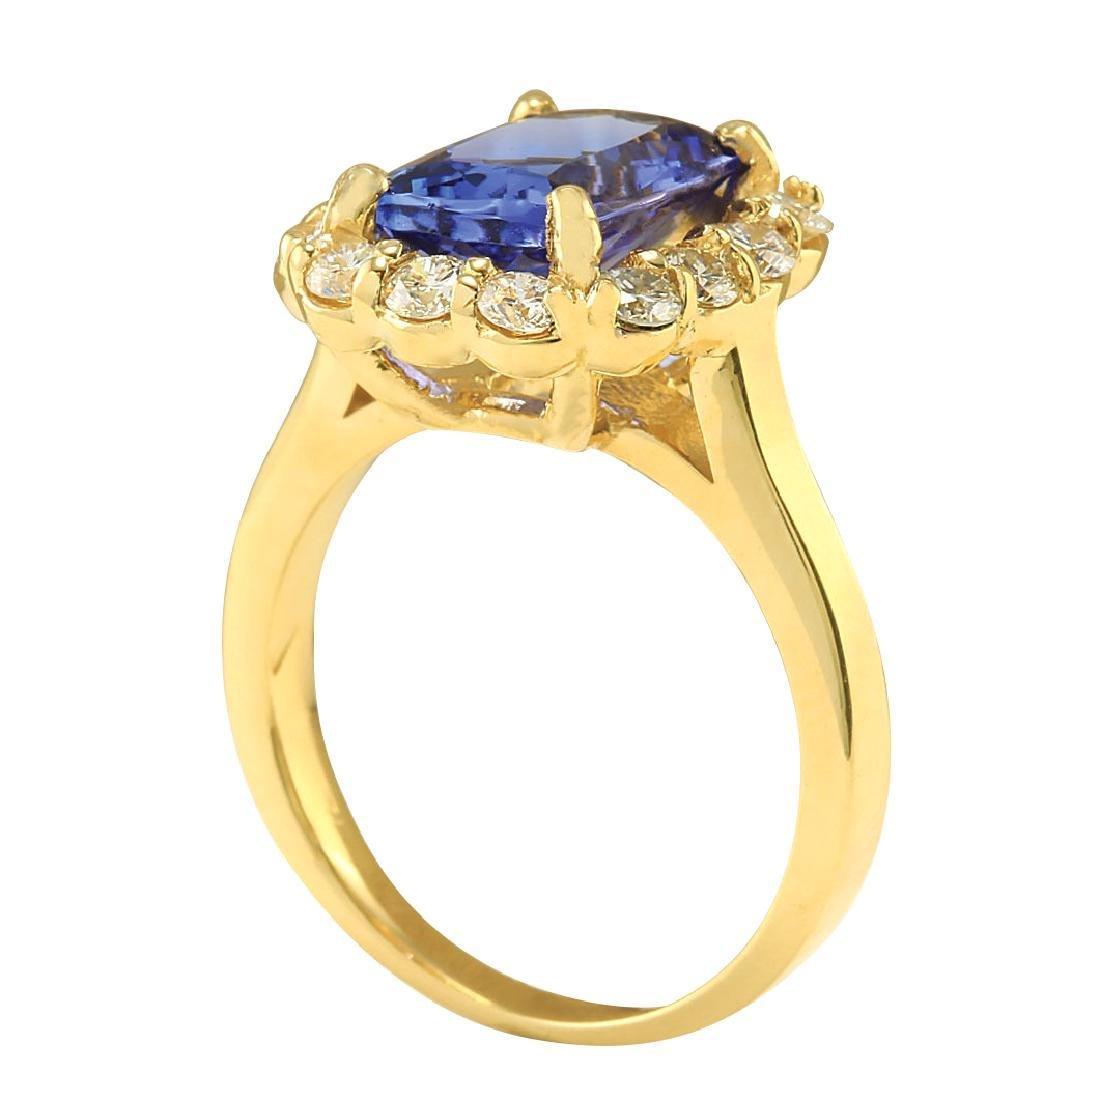 4.15CTW Natural Tanzanite And Diamond Ring In 18K - 3